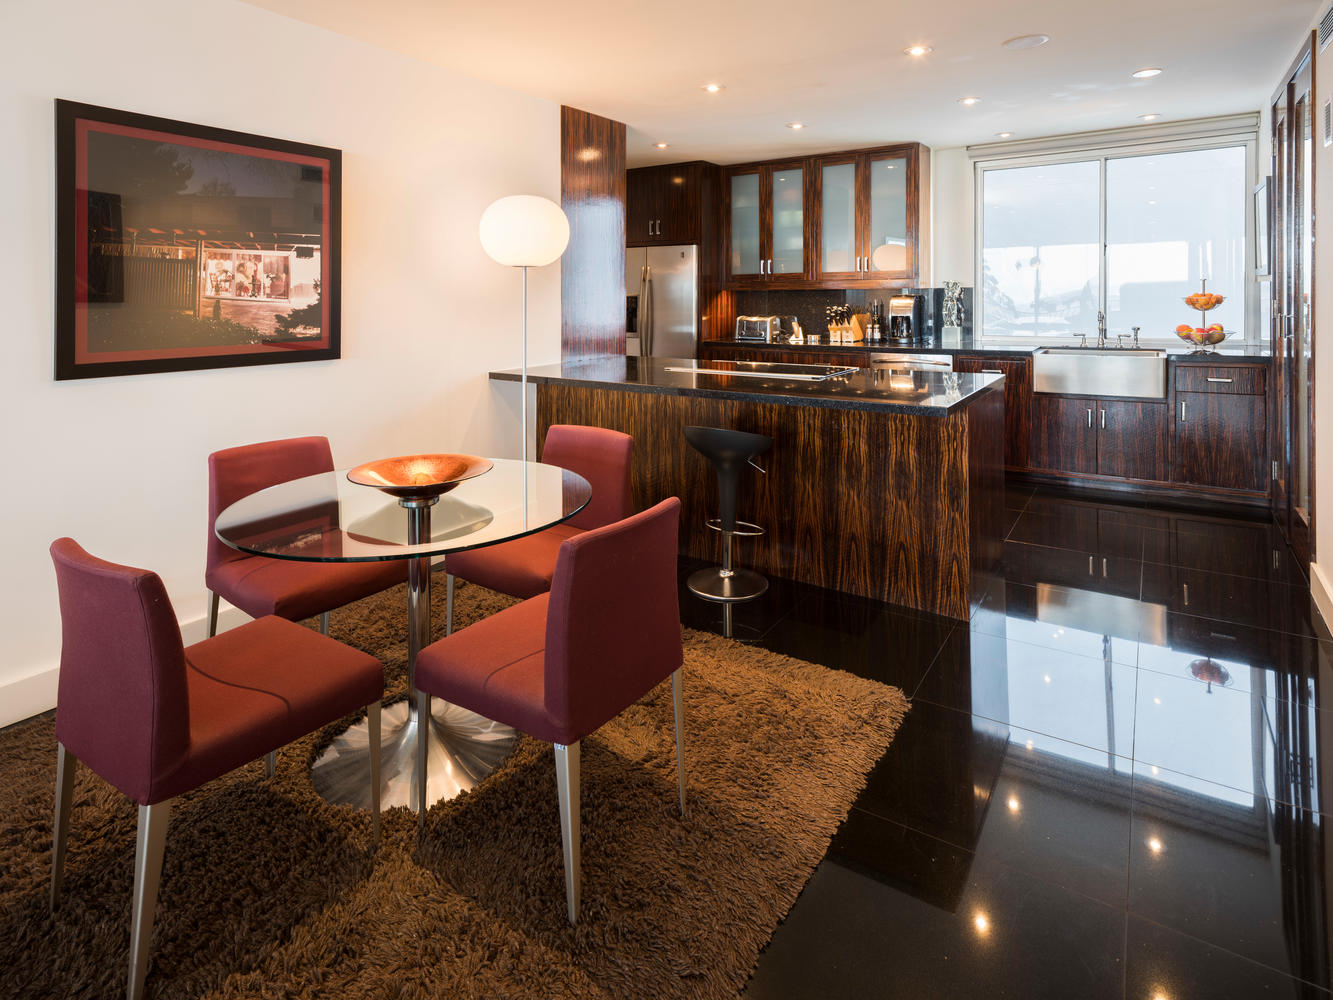 1100 Alta Loma Rd West-large-013-18-Dining Room-1334x1000-72dpi.jpg